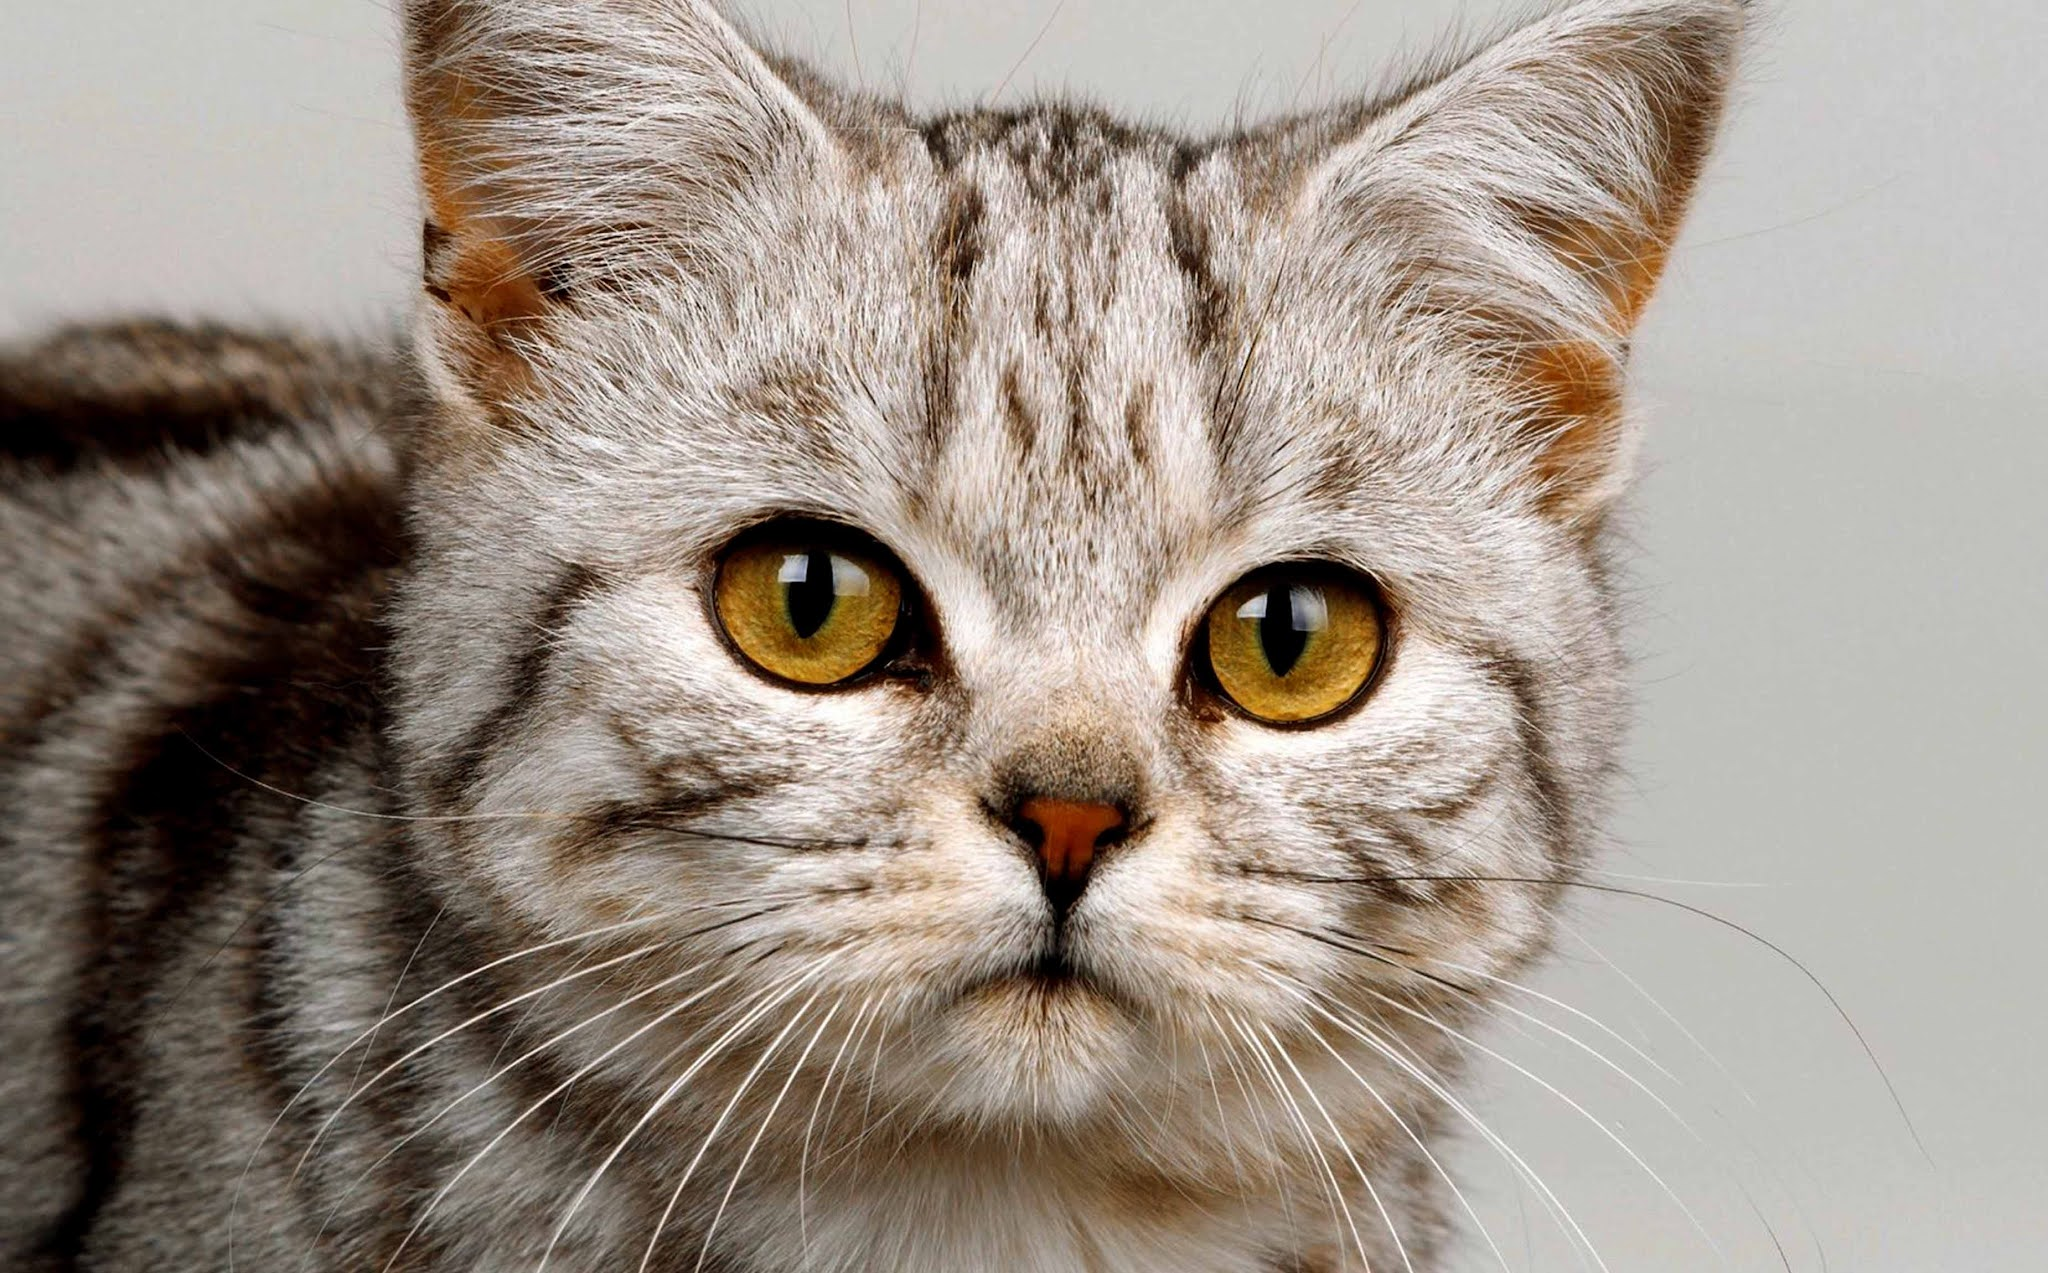 Free Wallpaper image kitten, cat, grass, walk, cute wallpaper, background Ultra HD 4K 5K 8K for Computer Desktop or Laptop